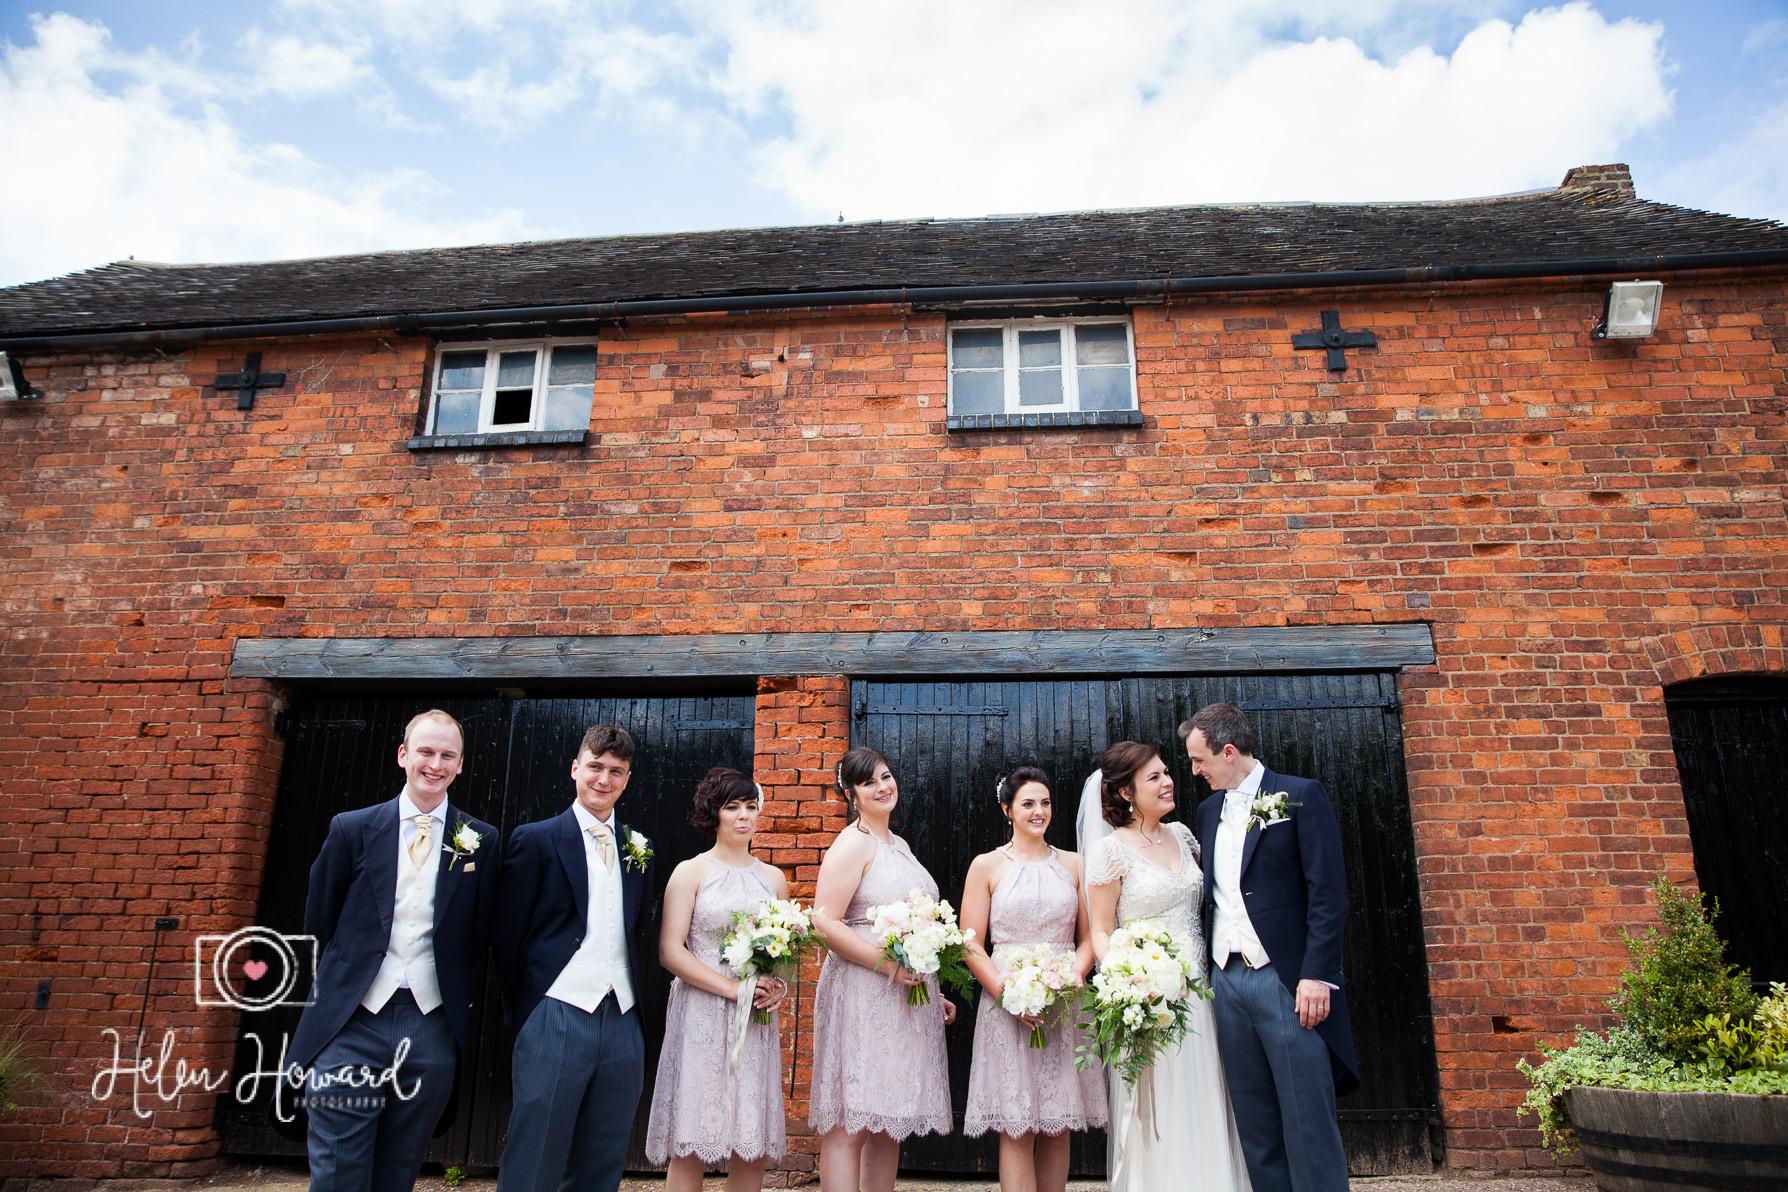 Helen Howard Photography Packington Moor Wedding-74.jpg